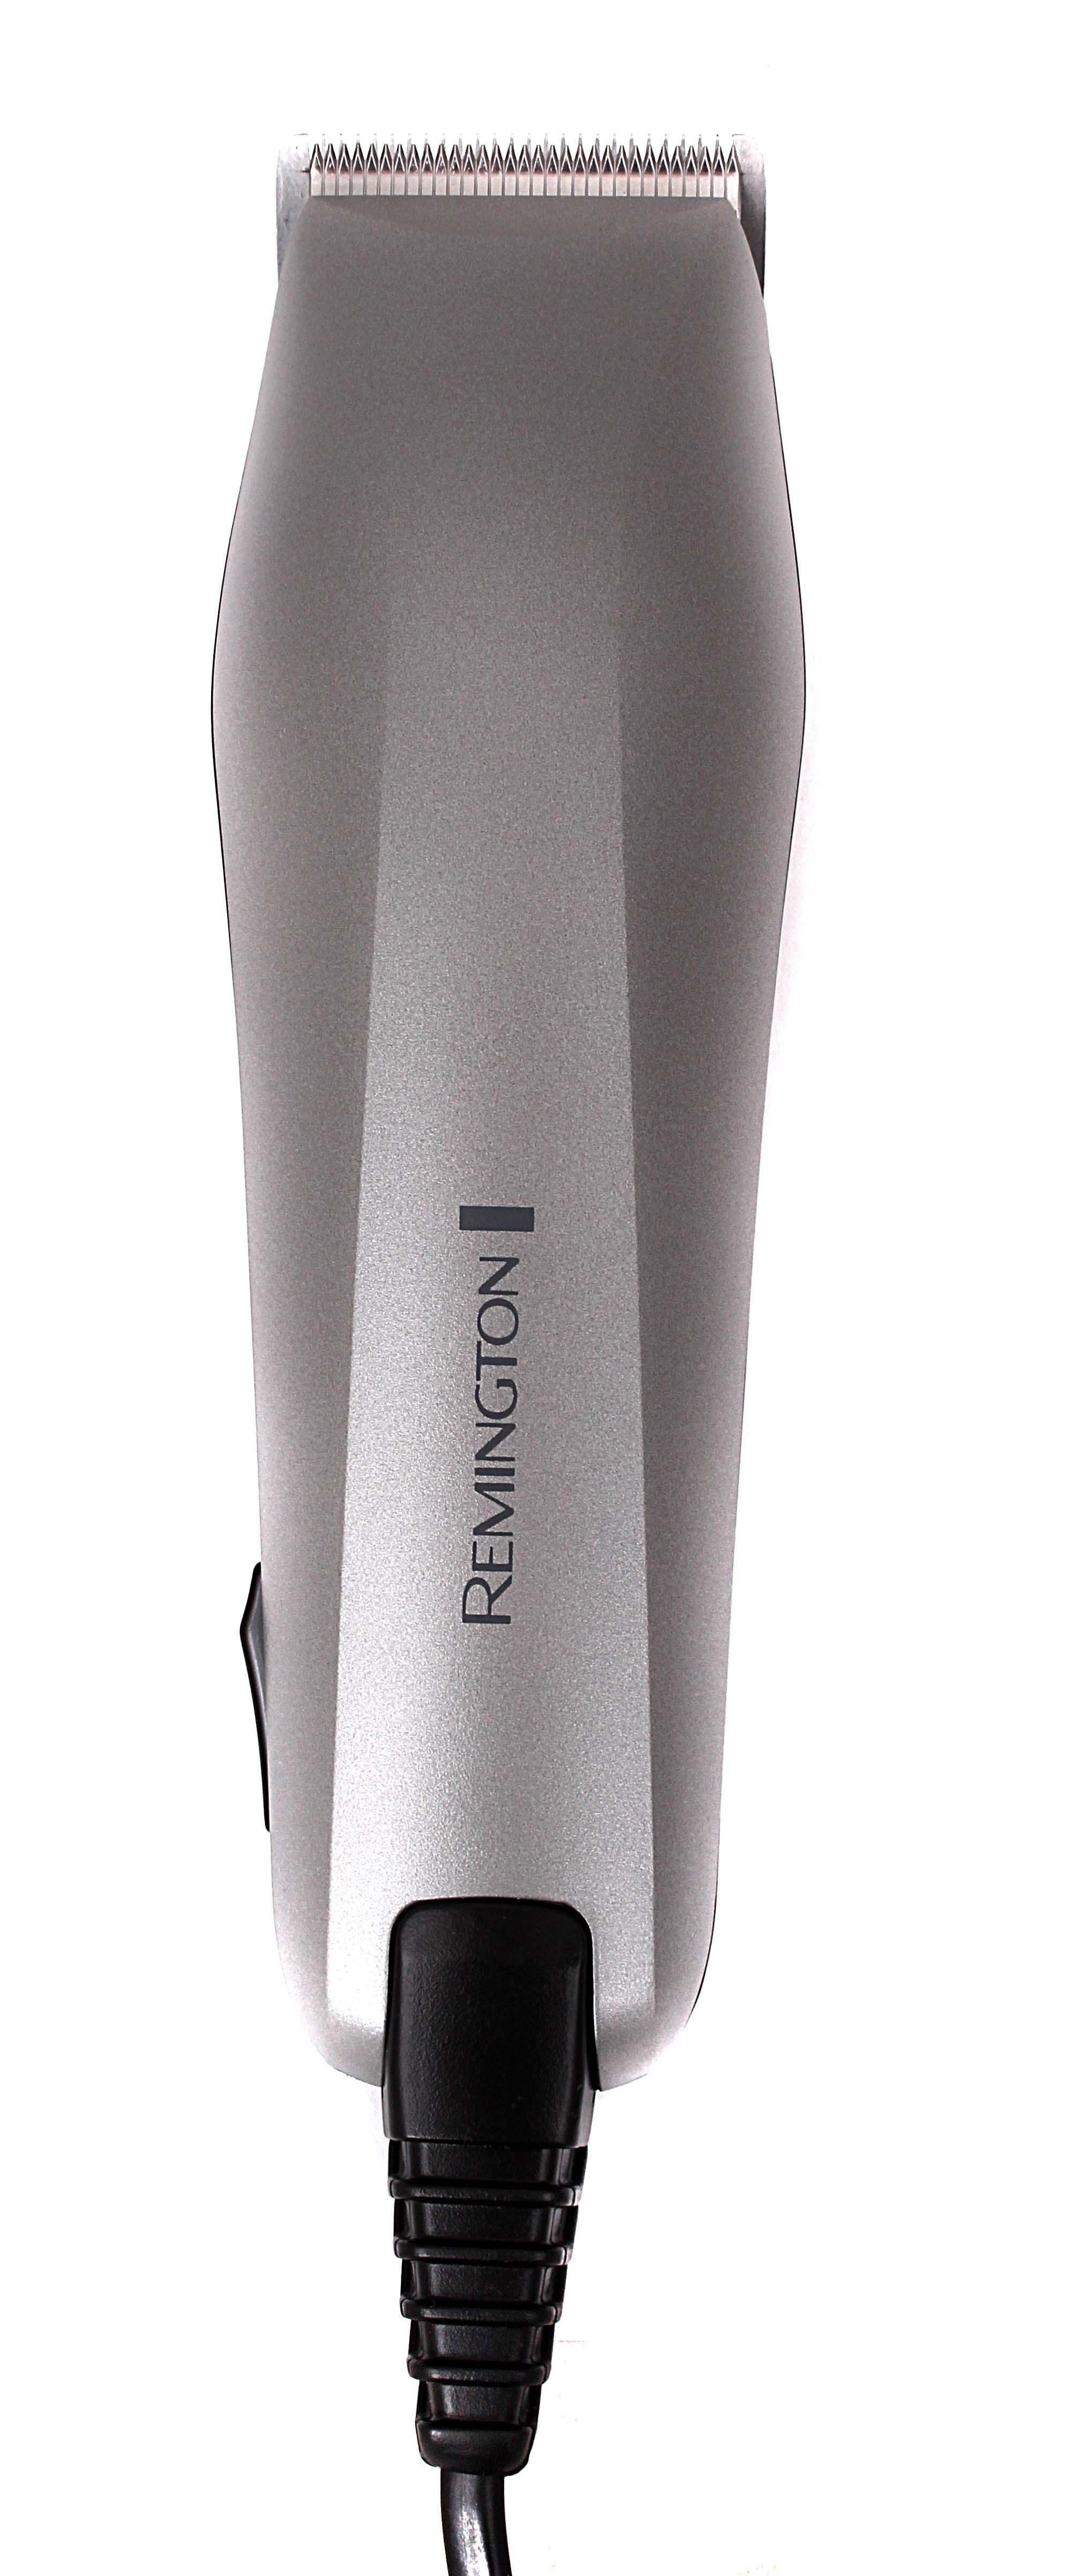 Машинки для стрижки Remington Real Brand Technics 690.000